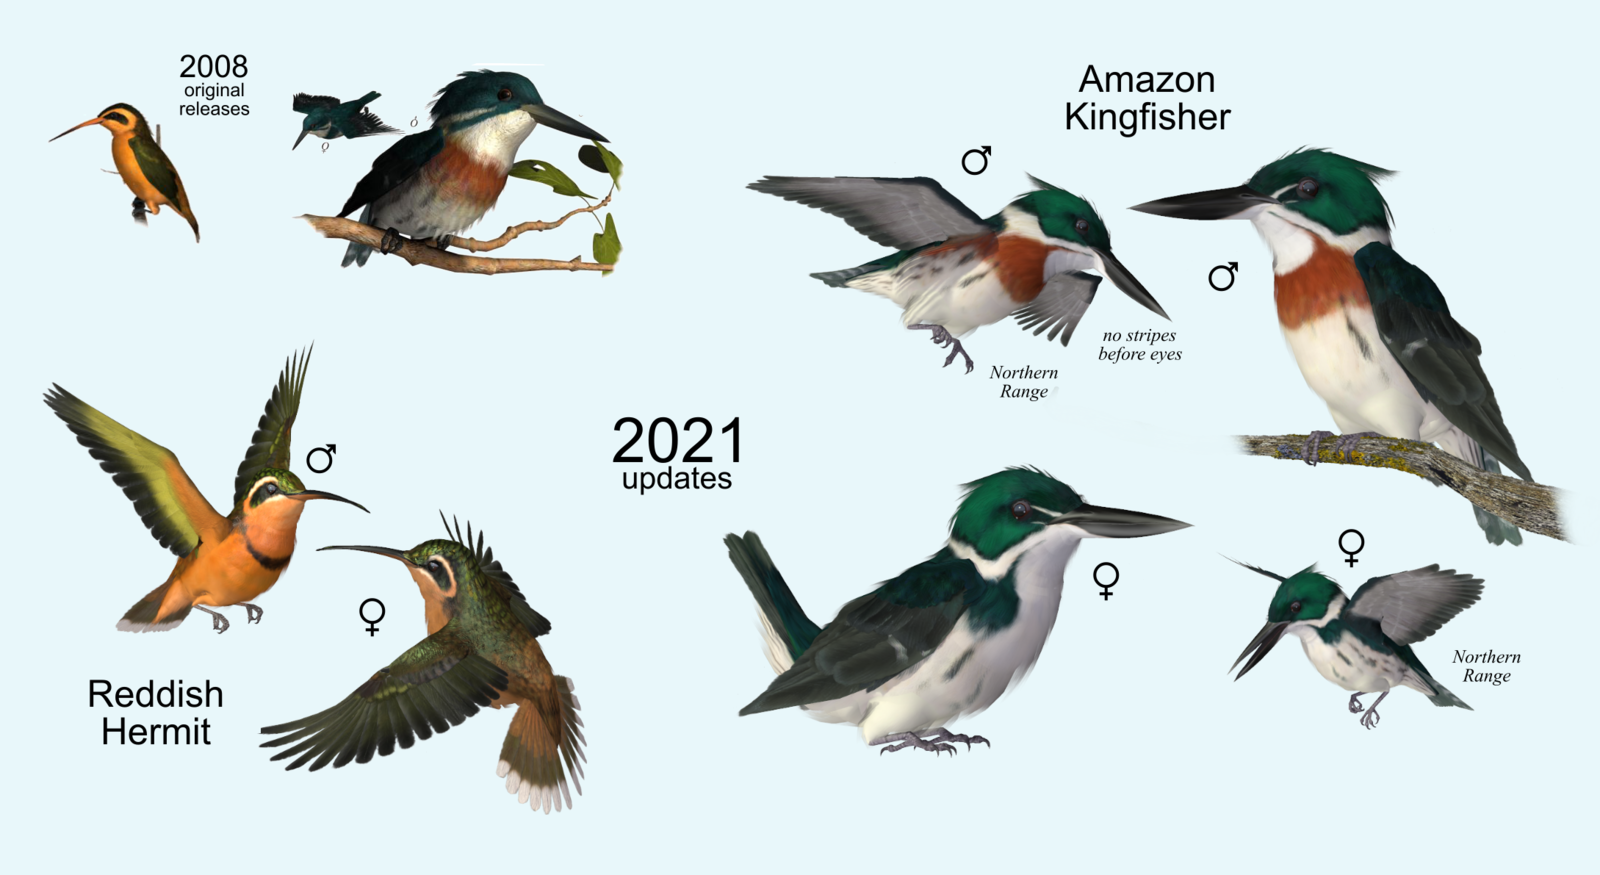 Amazon comparsion2.png